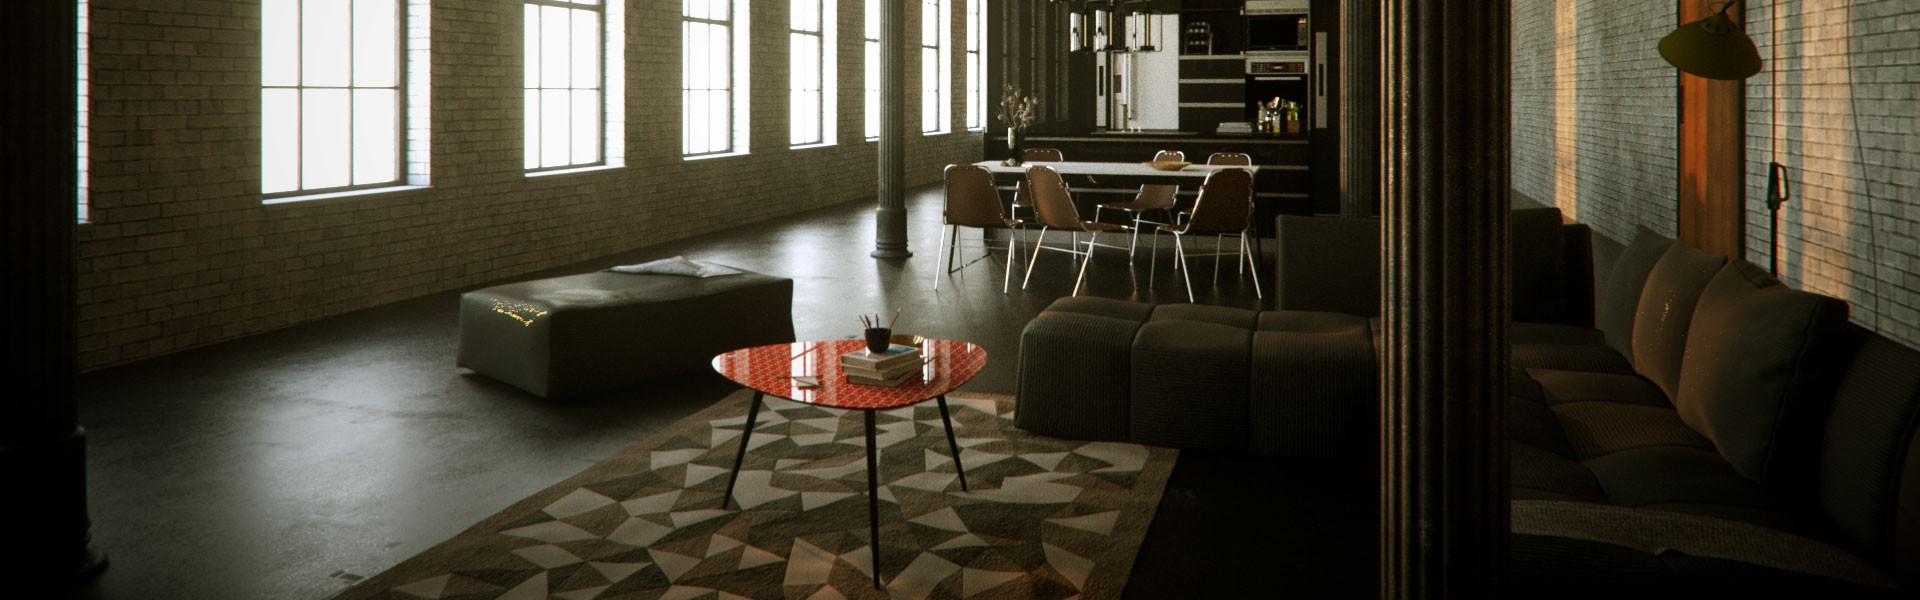 Tables basses design haut de gamme